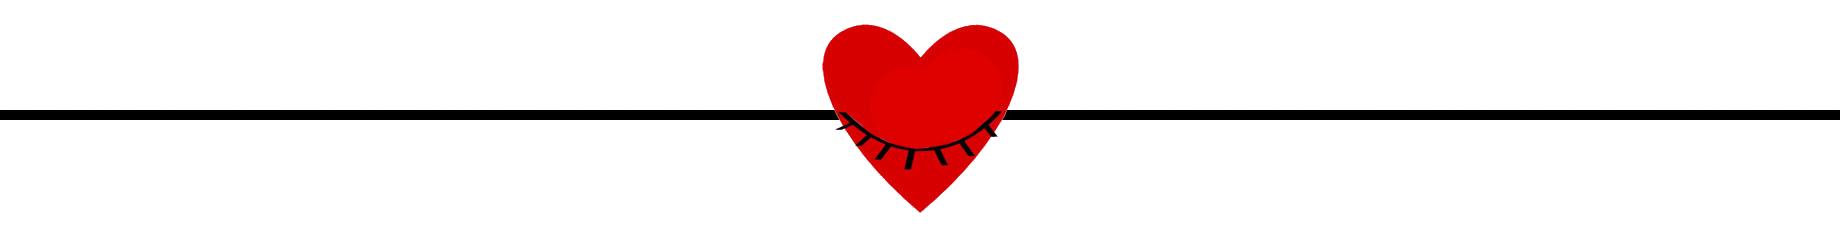 Hatrik Heart.png